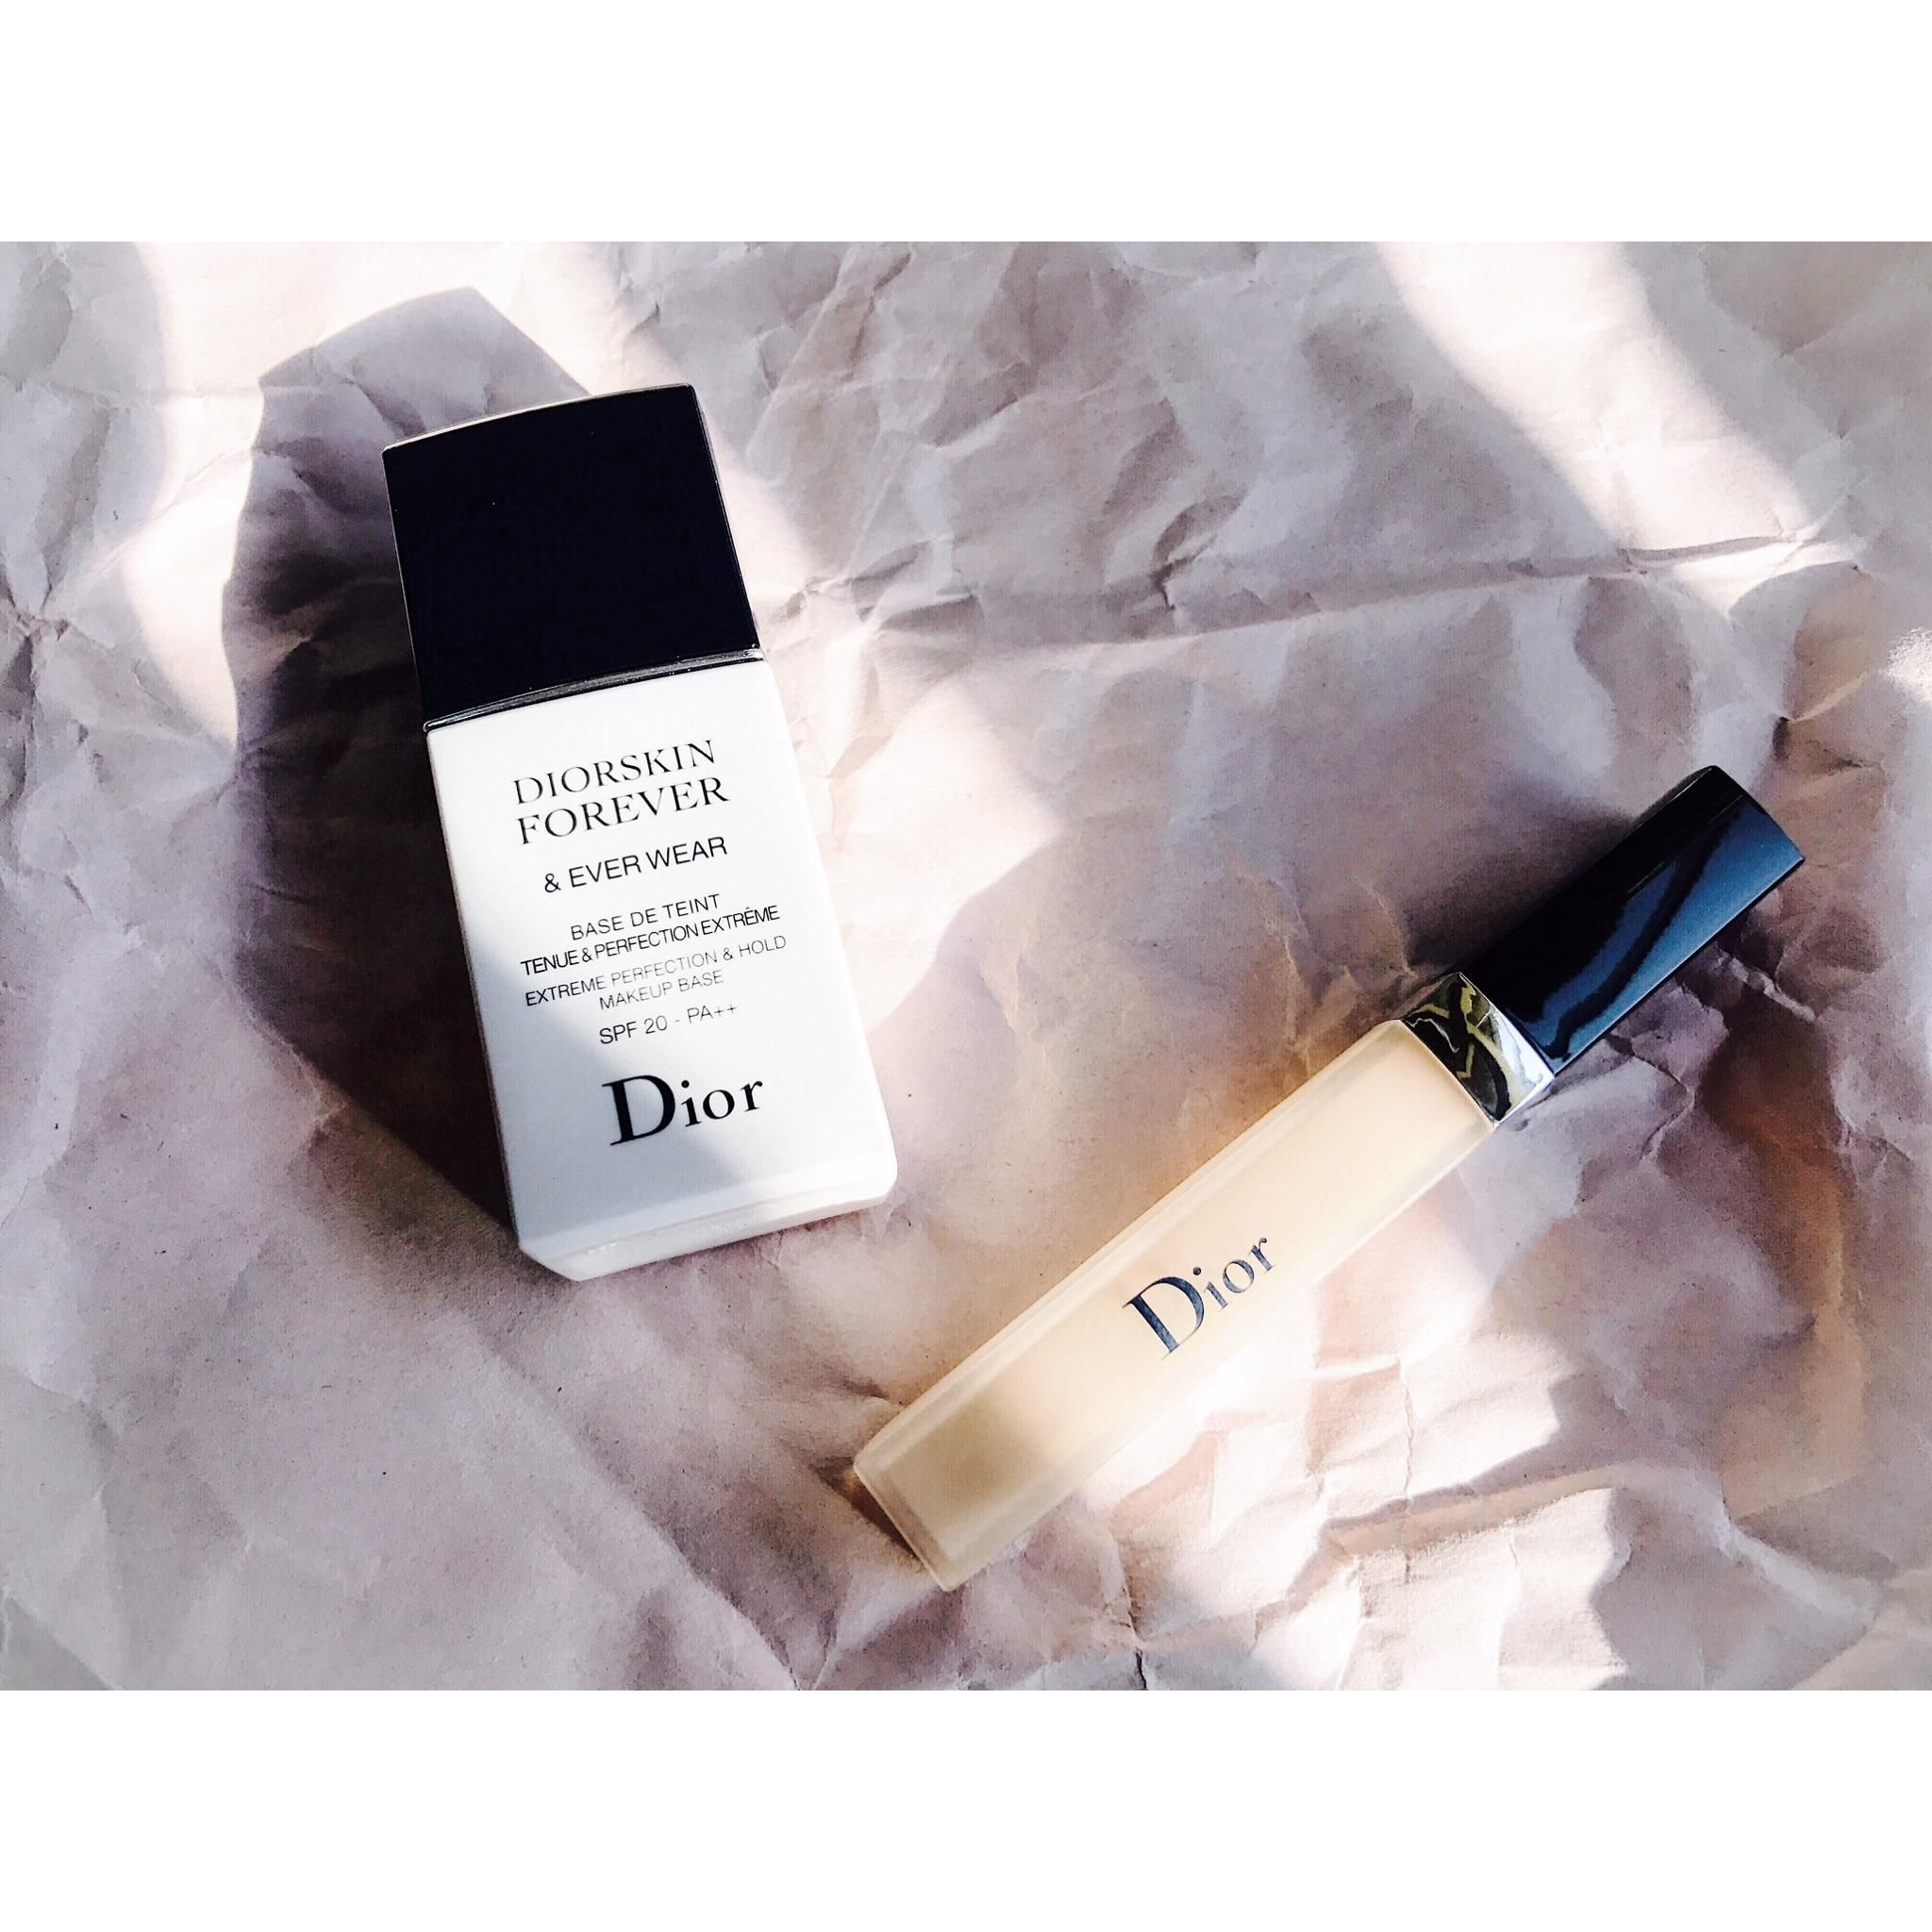 hot sale online cee27 fe983 ディオールスキン フォーエヴァー&エヴァー ベース / Dior ychi ...